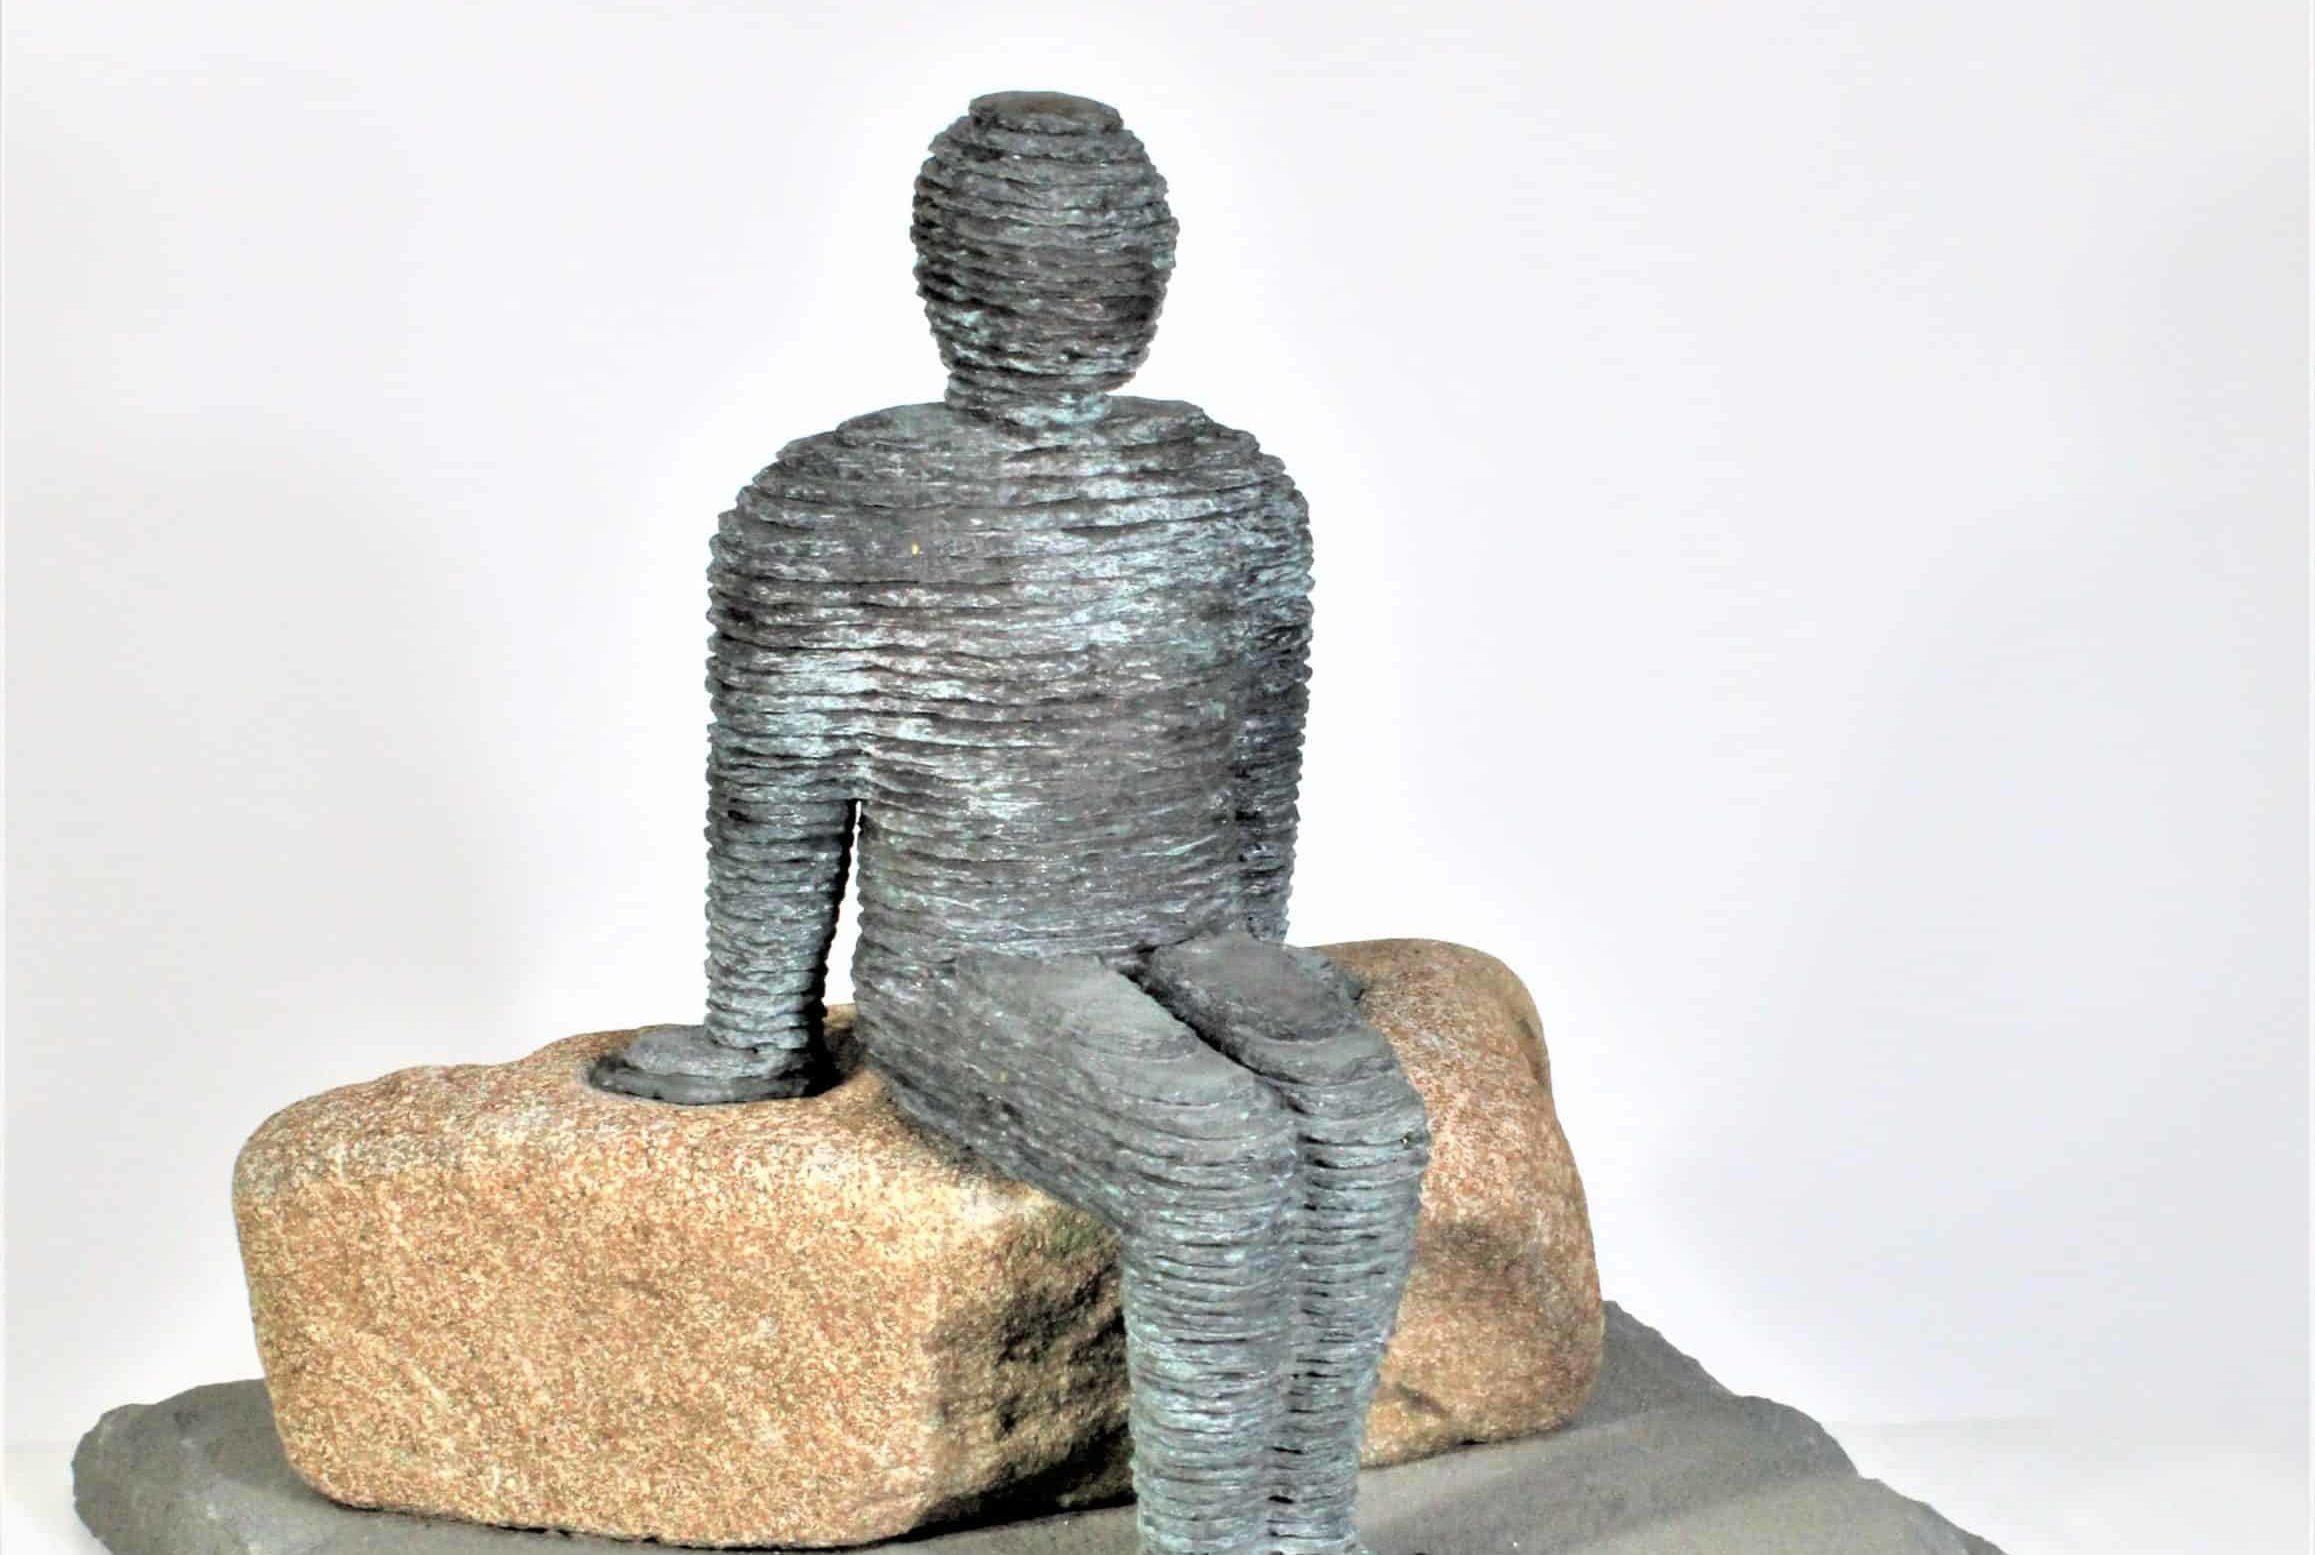 Boaz Vaadia (1951-) Layered Bluestone Sculpture